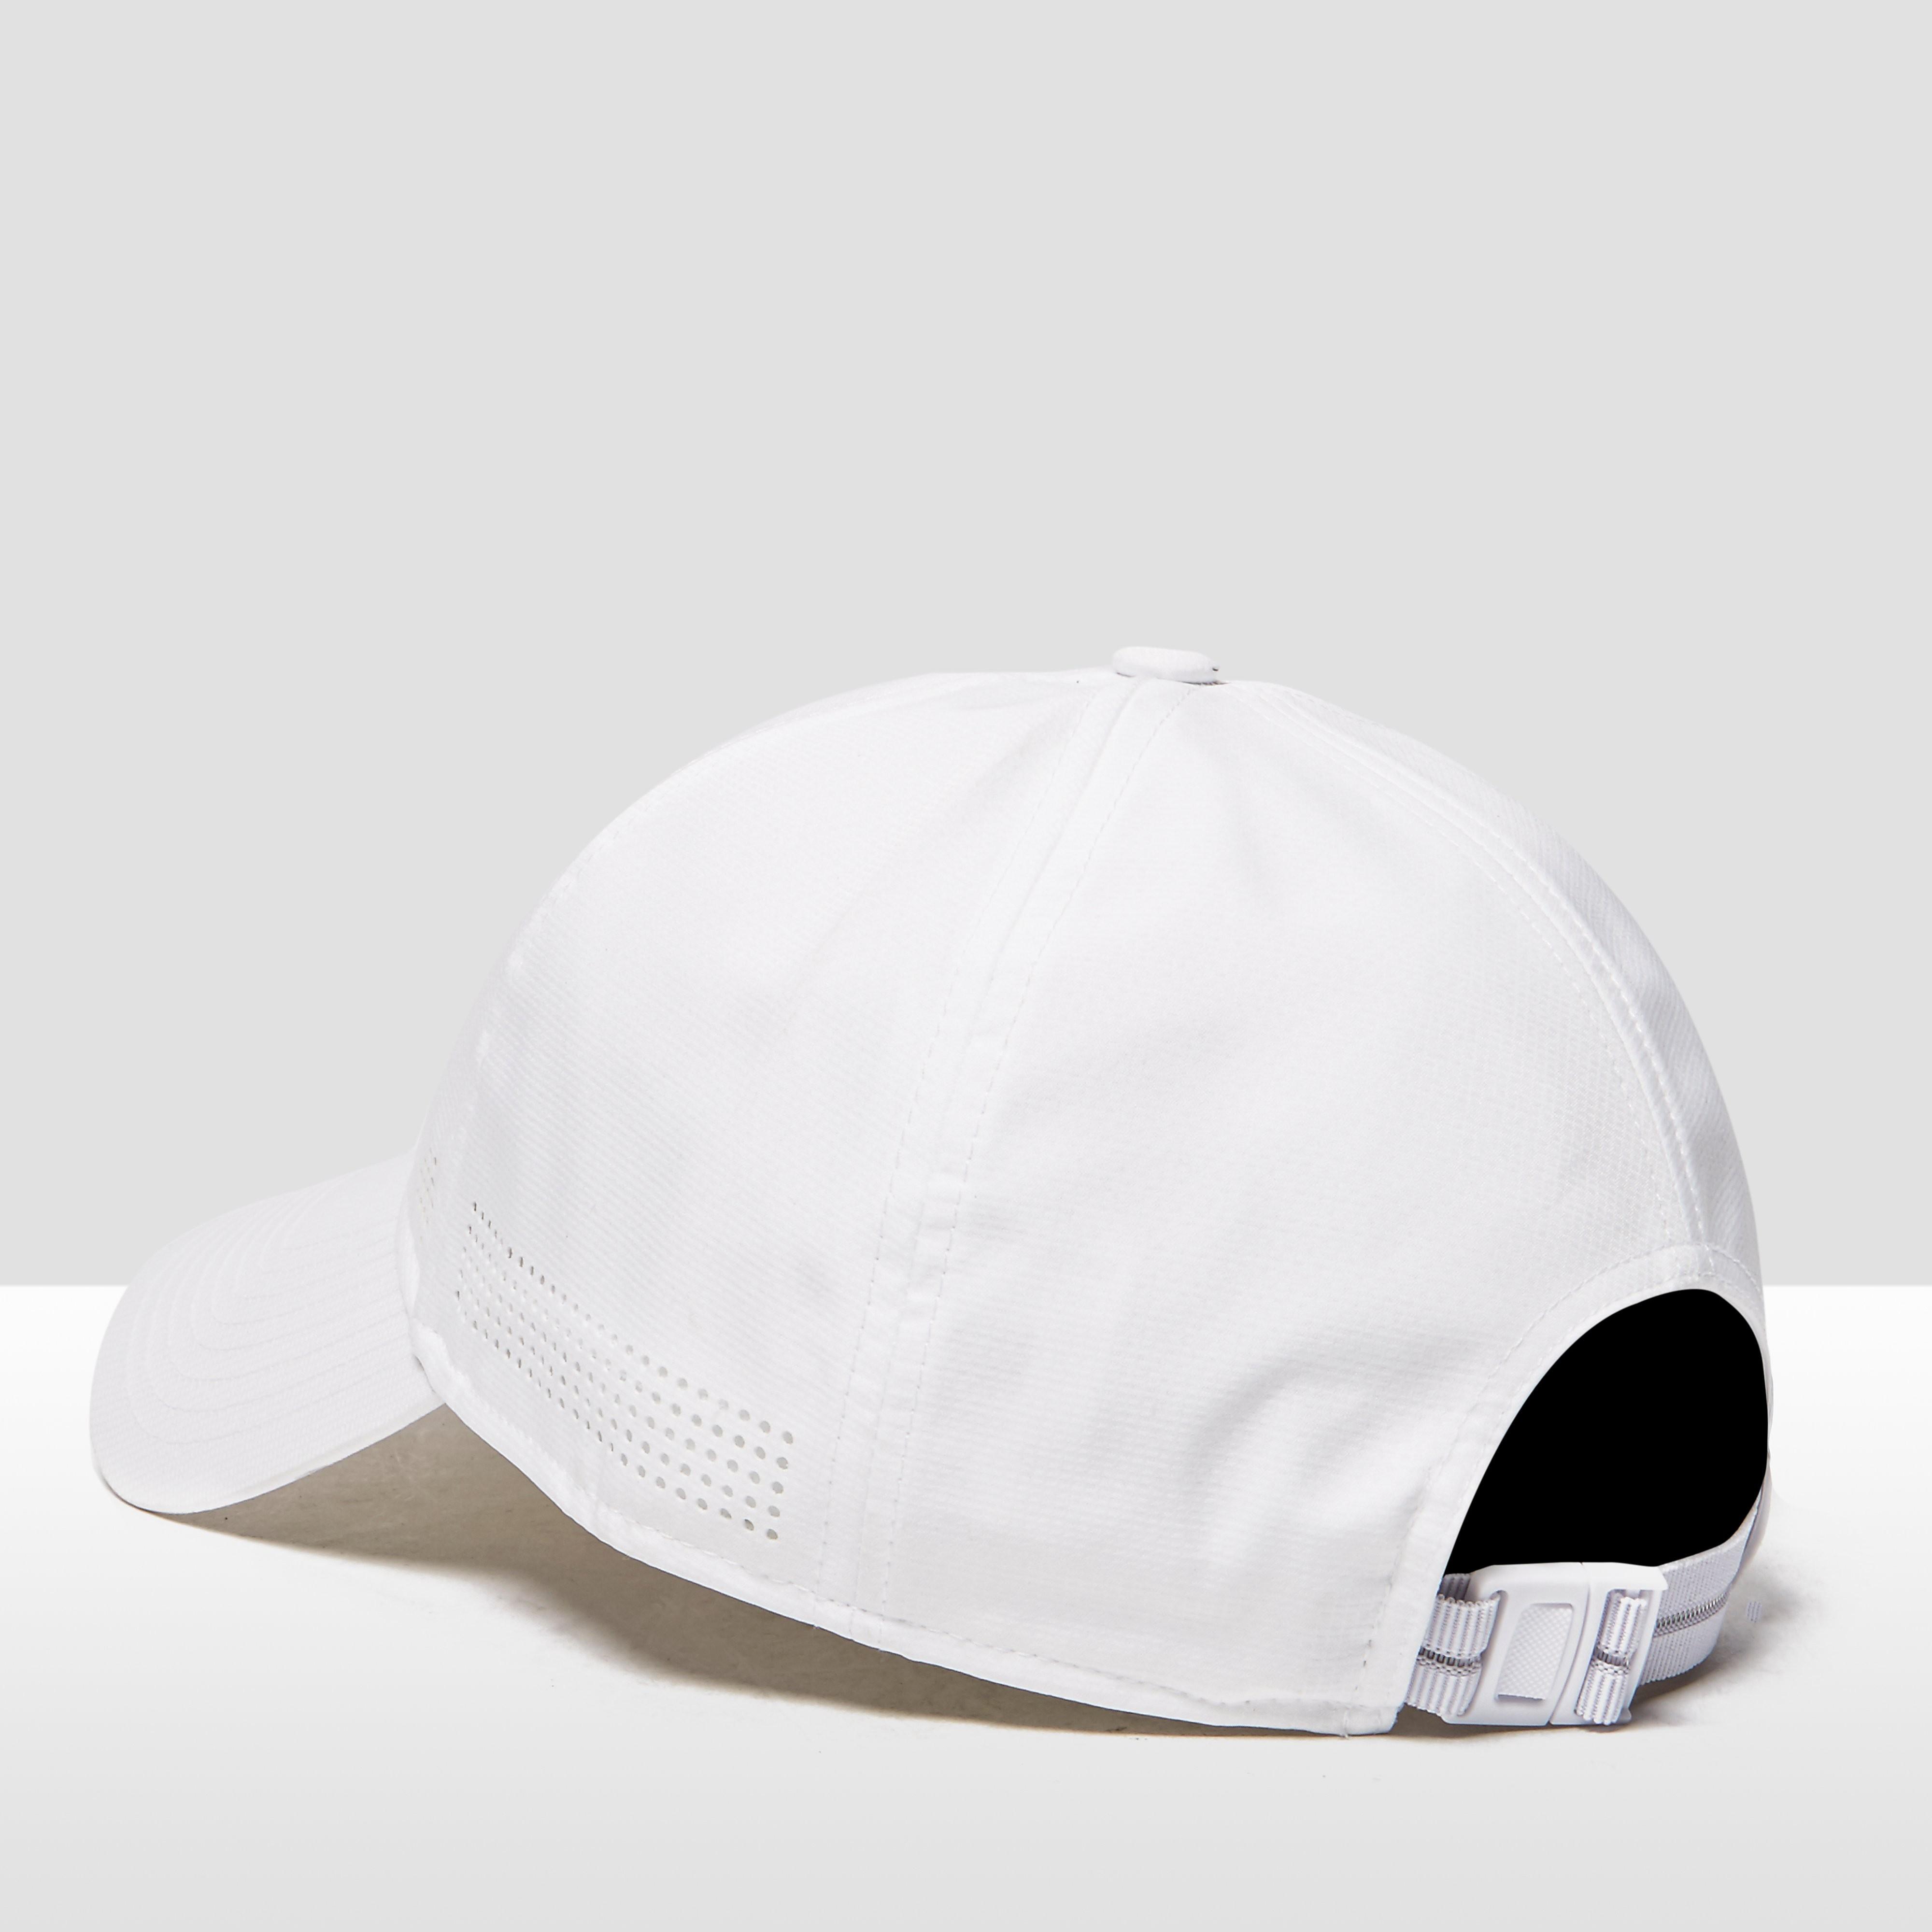 adidas Classic Six-Panel Climalite Men's Cap